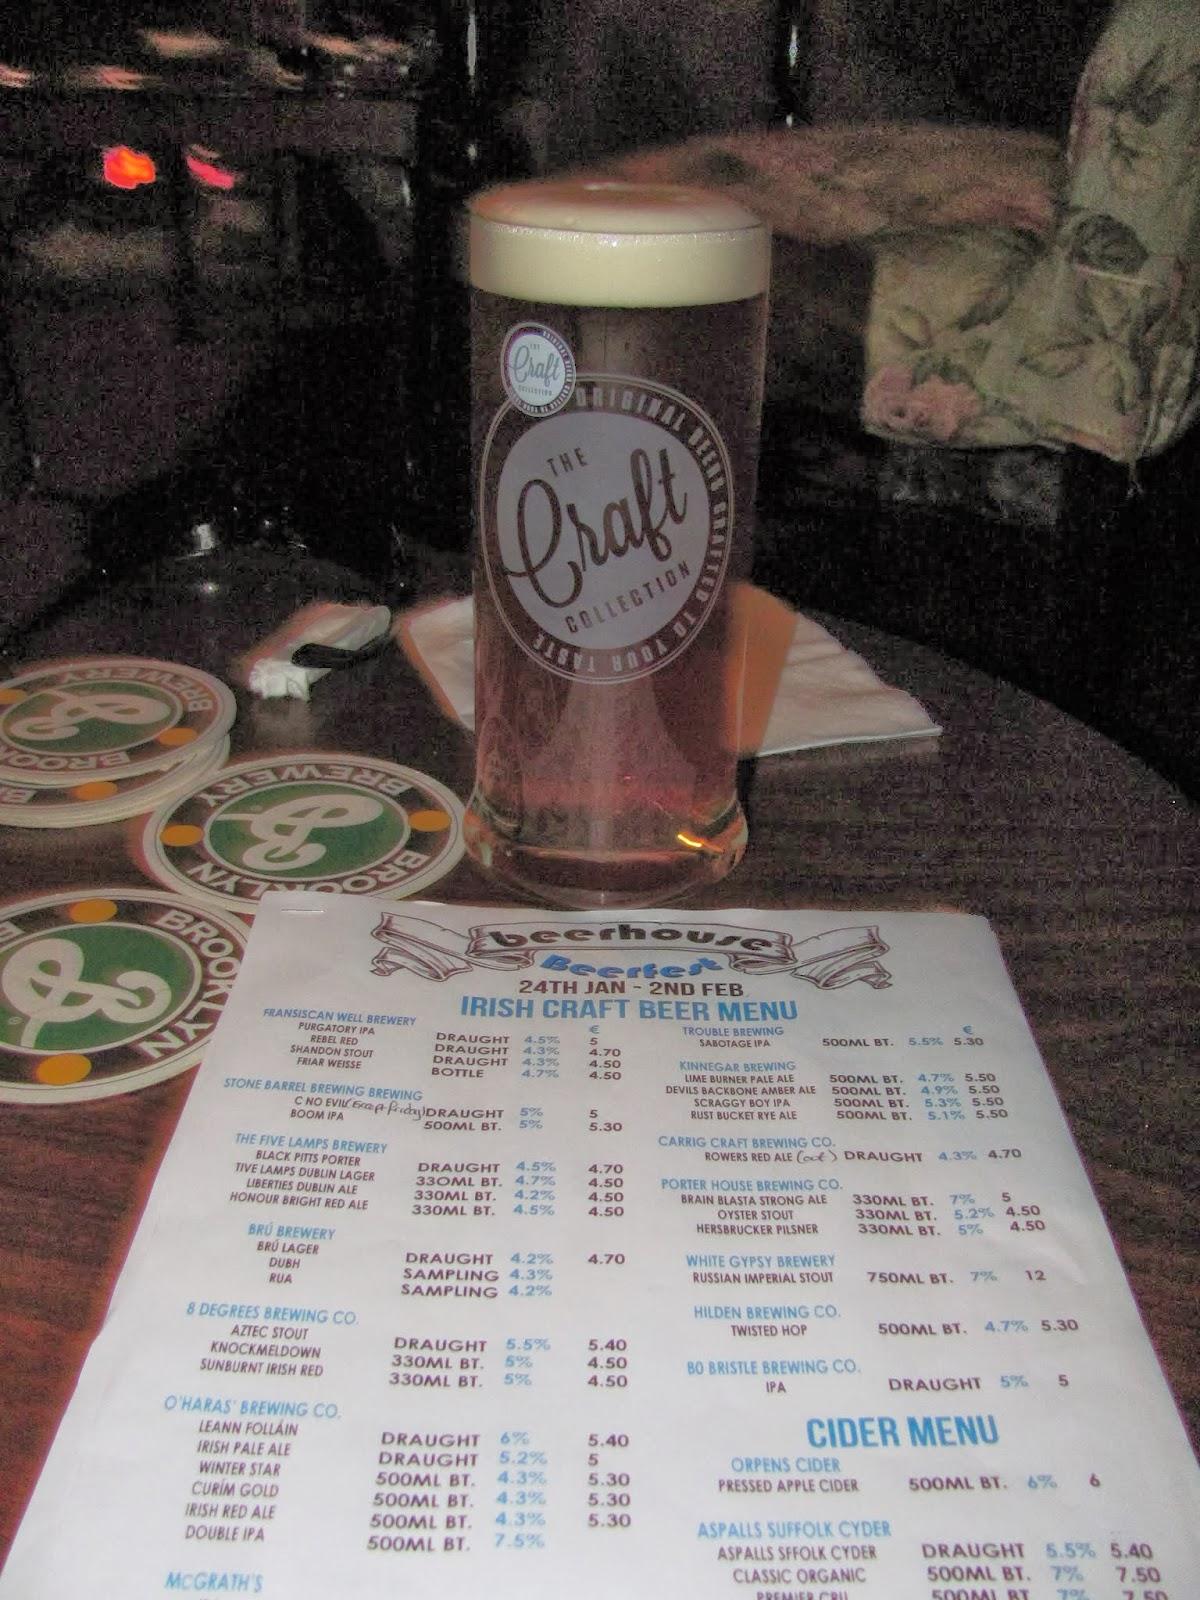 Beerhouse Menu in Dublin, Ireland